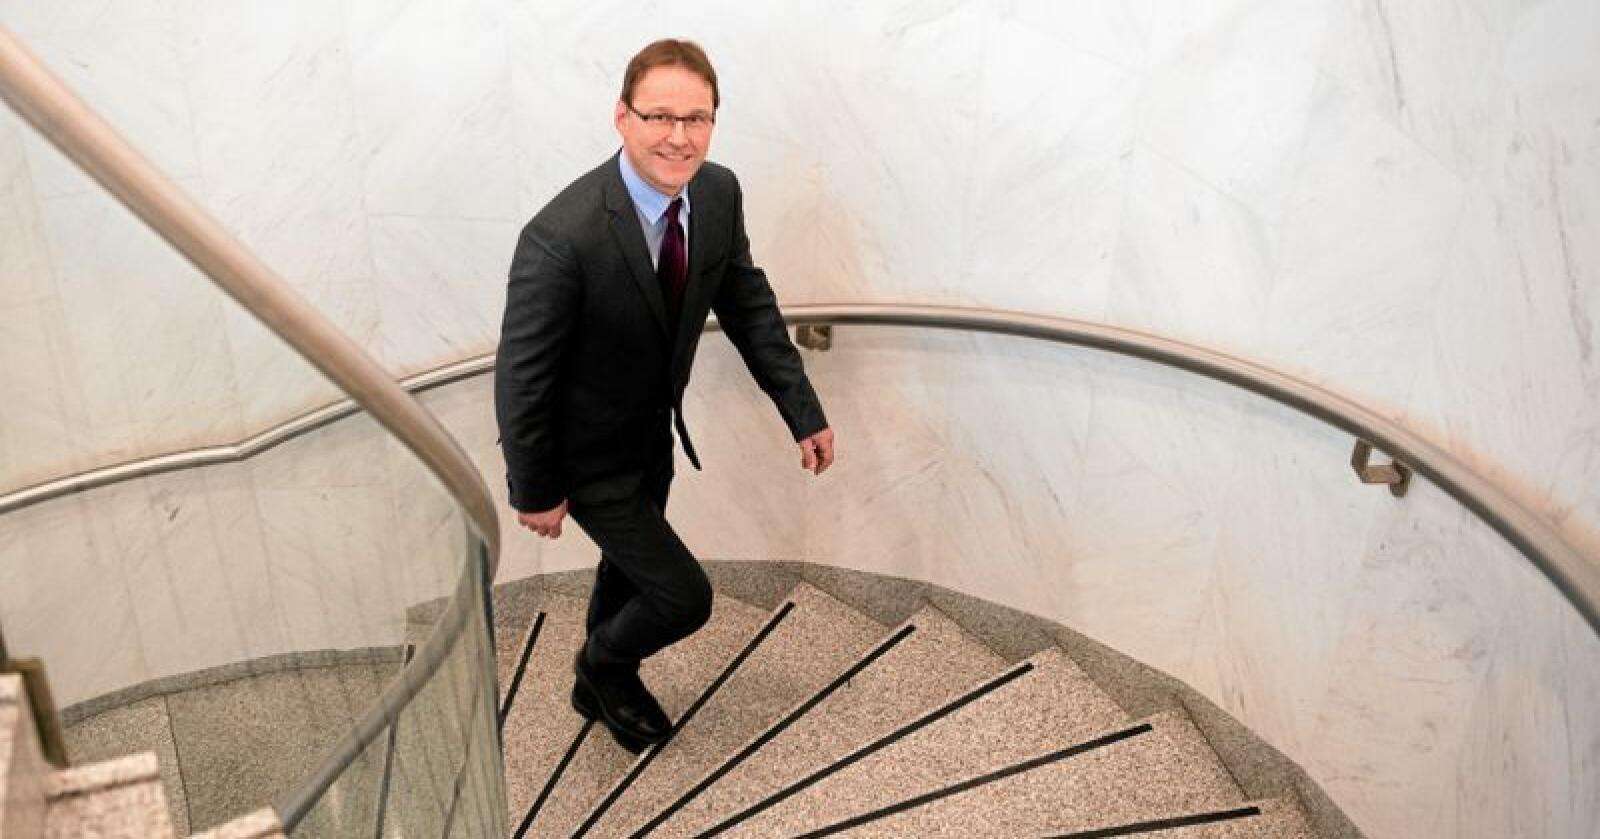 Statssekretær Widar Skogan i Landbruks- og matdepartementet. Foto: Torbjørn Tandberg